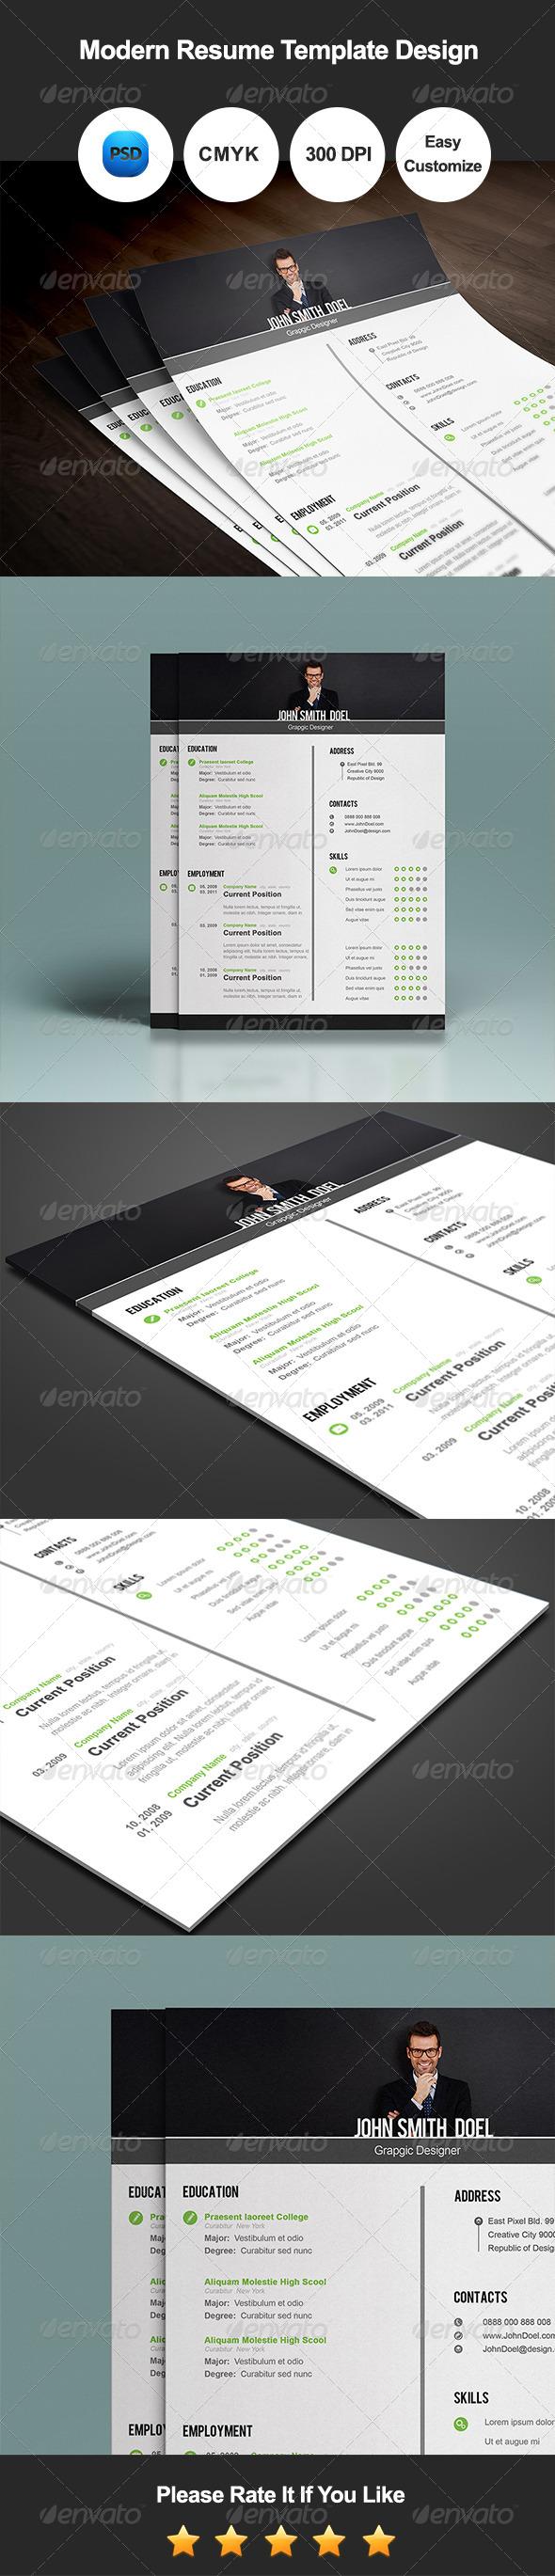 GraphicRiver Modern Resume Template Design 7717198